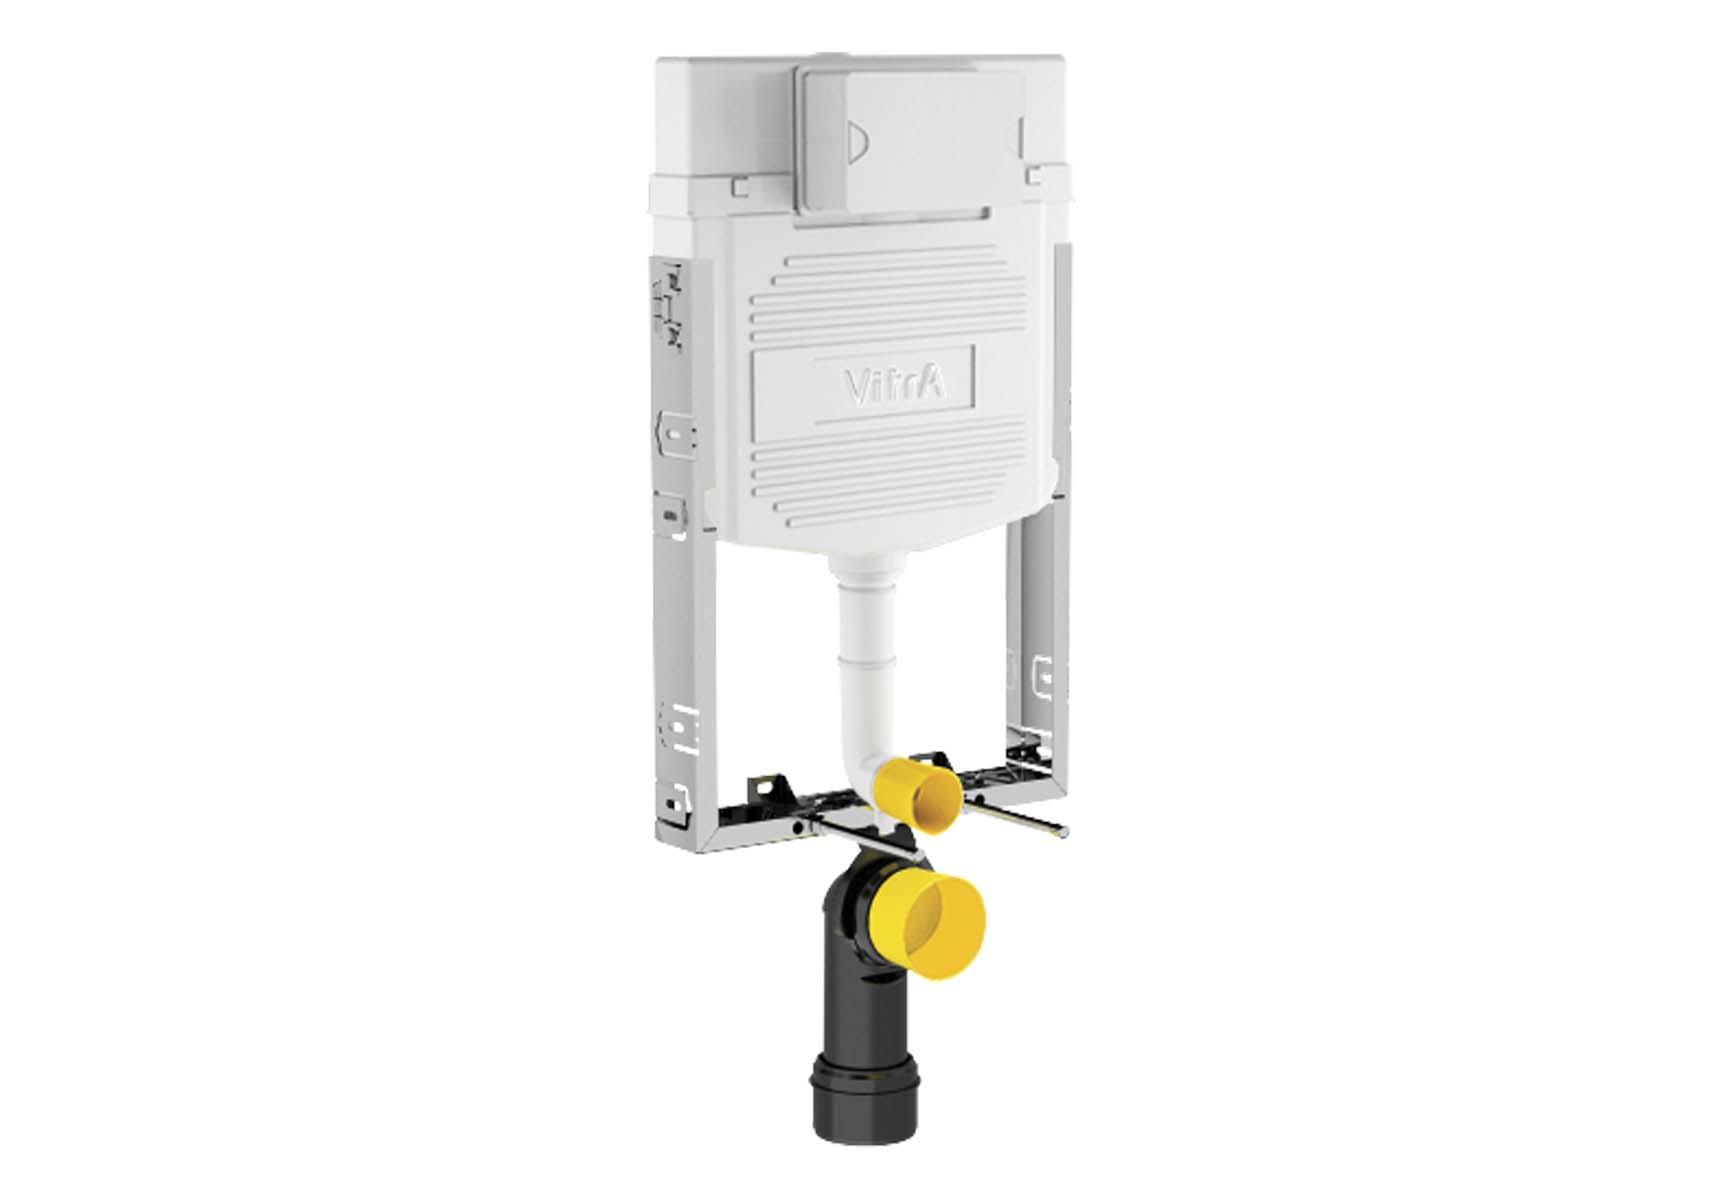 Standard Installation - 2,5 / 4 Liter Concealed Cistern Set (without metal brackets) - 8 cm